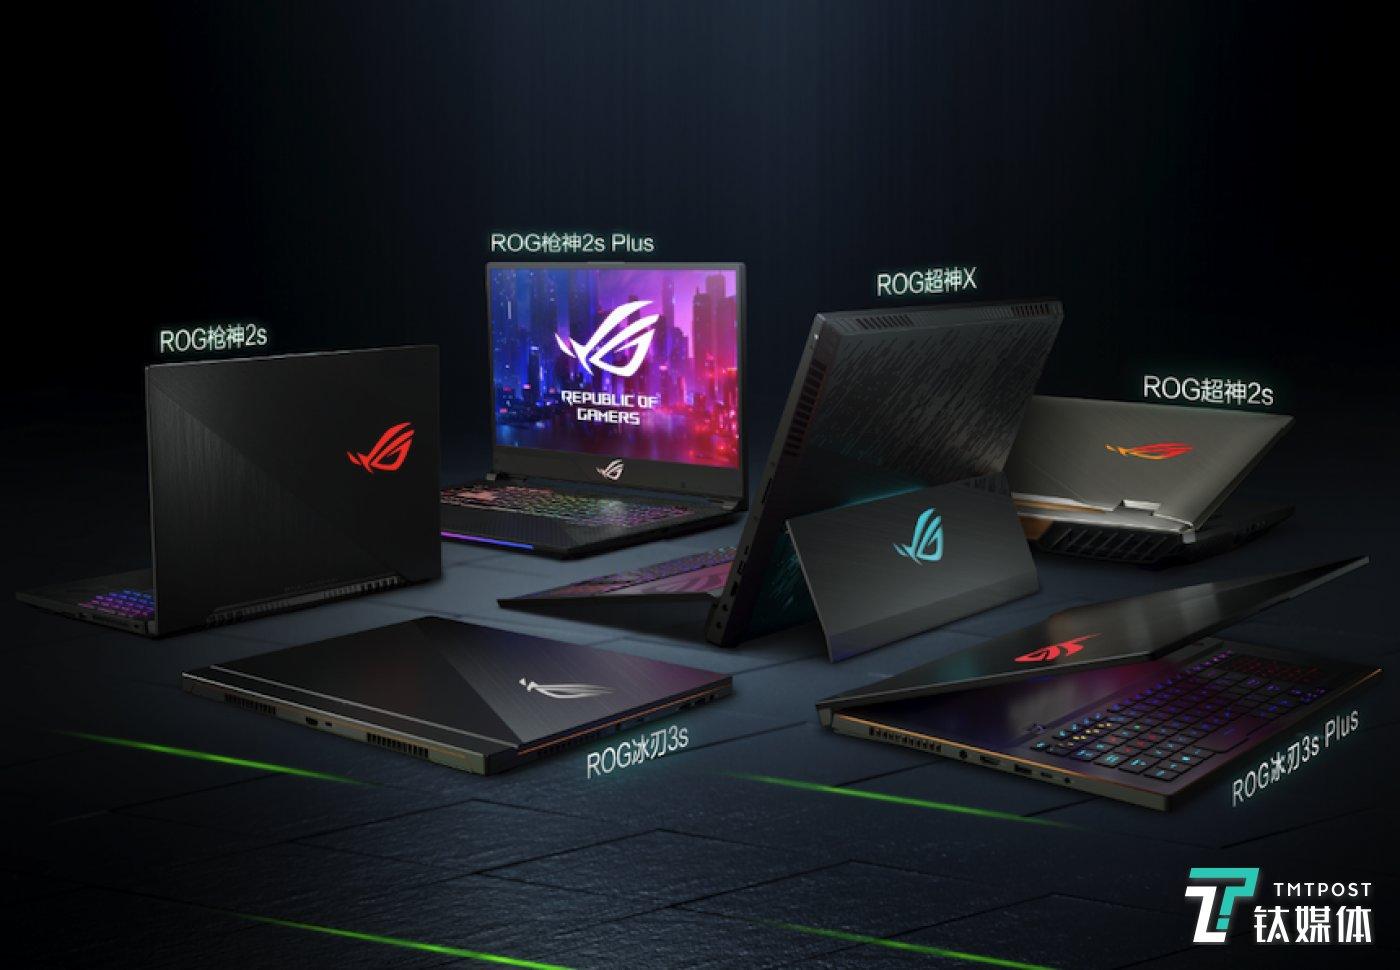 ROG游戏笔记本电脑全面升级GeForce RTX显卡